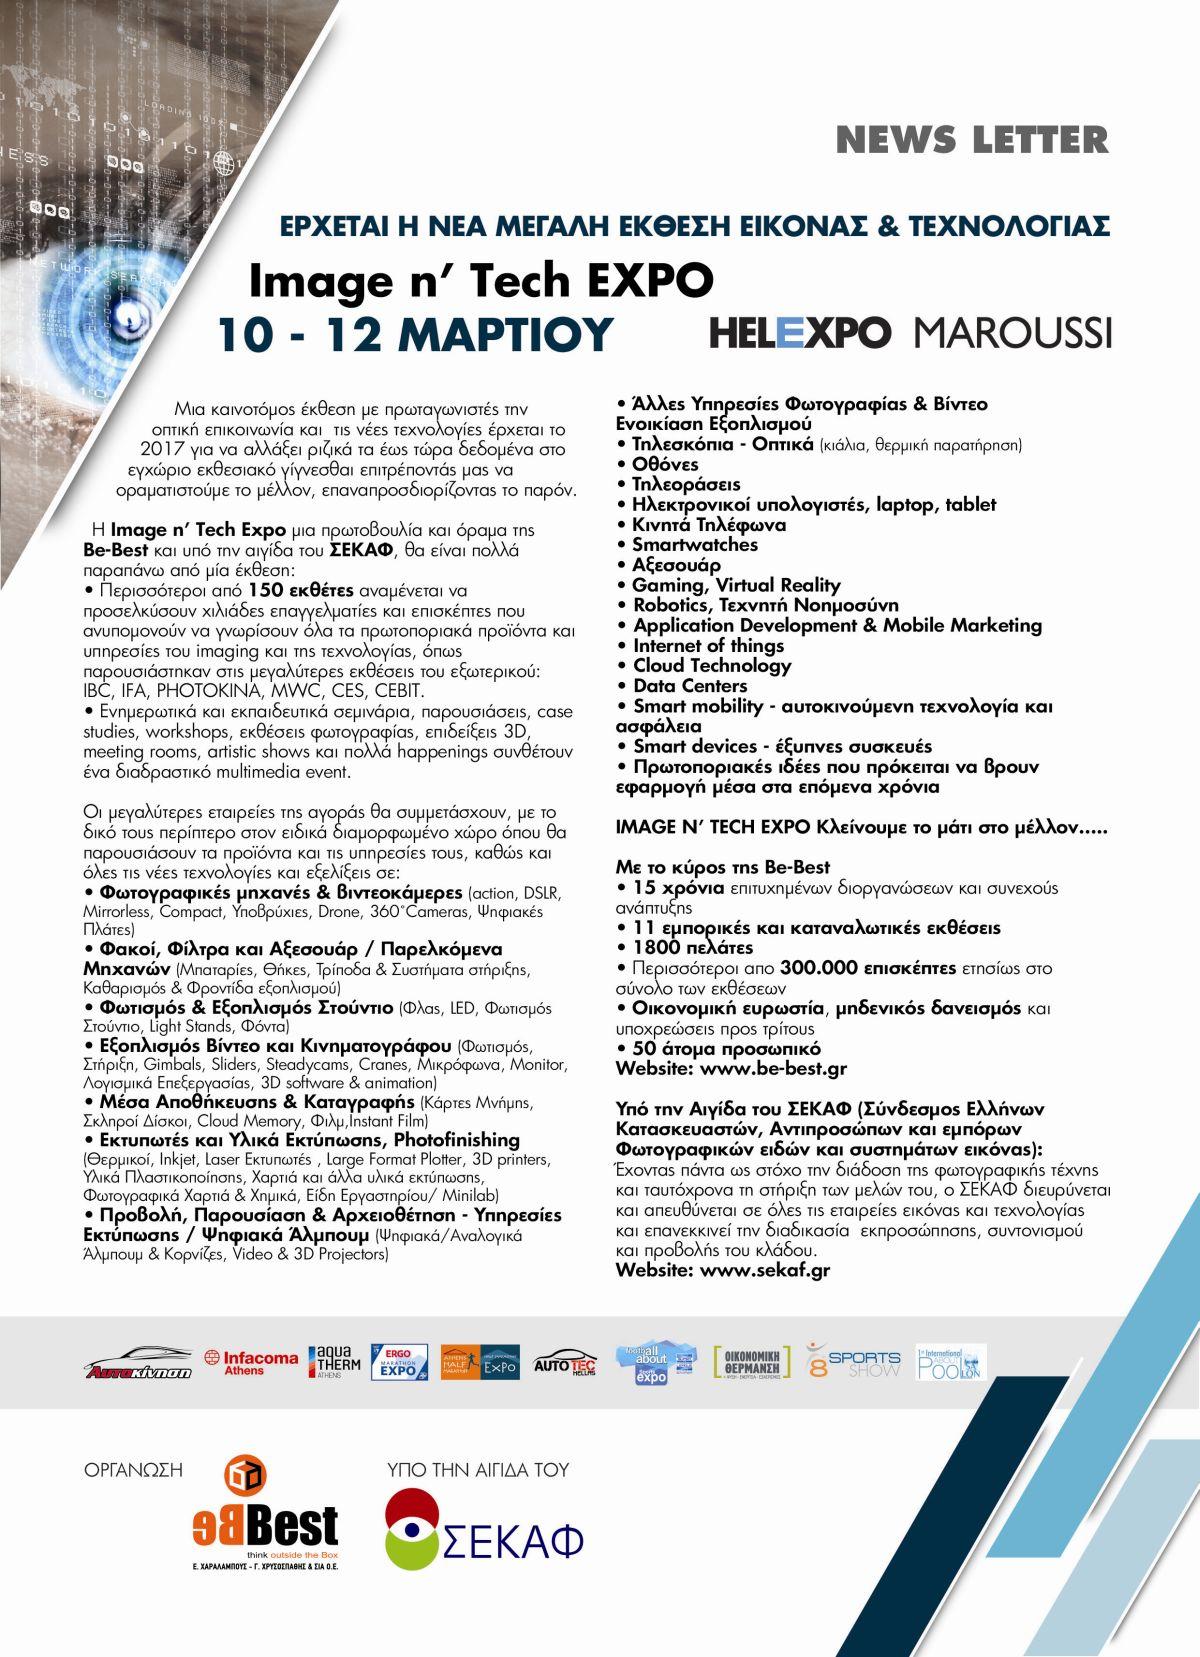 newsletter-image-n-tech-expo_1200